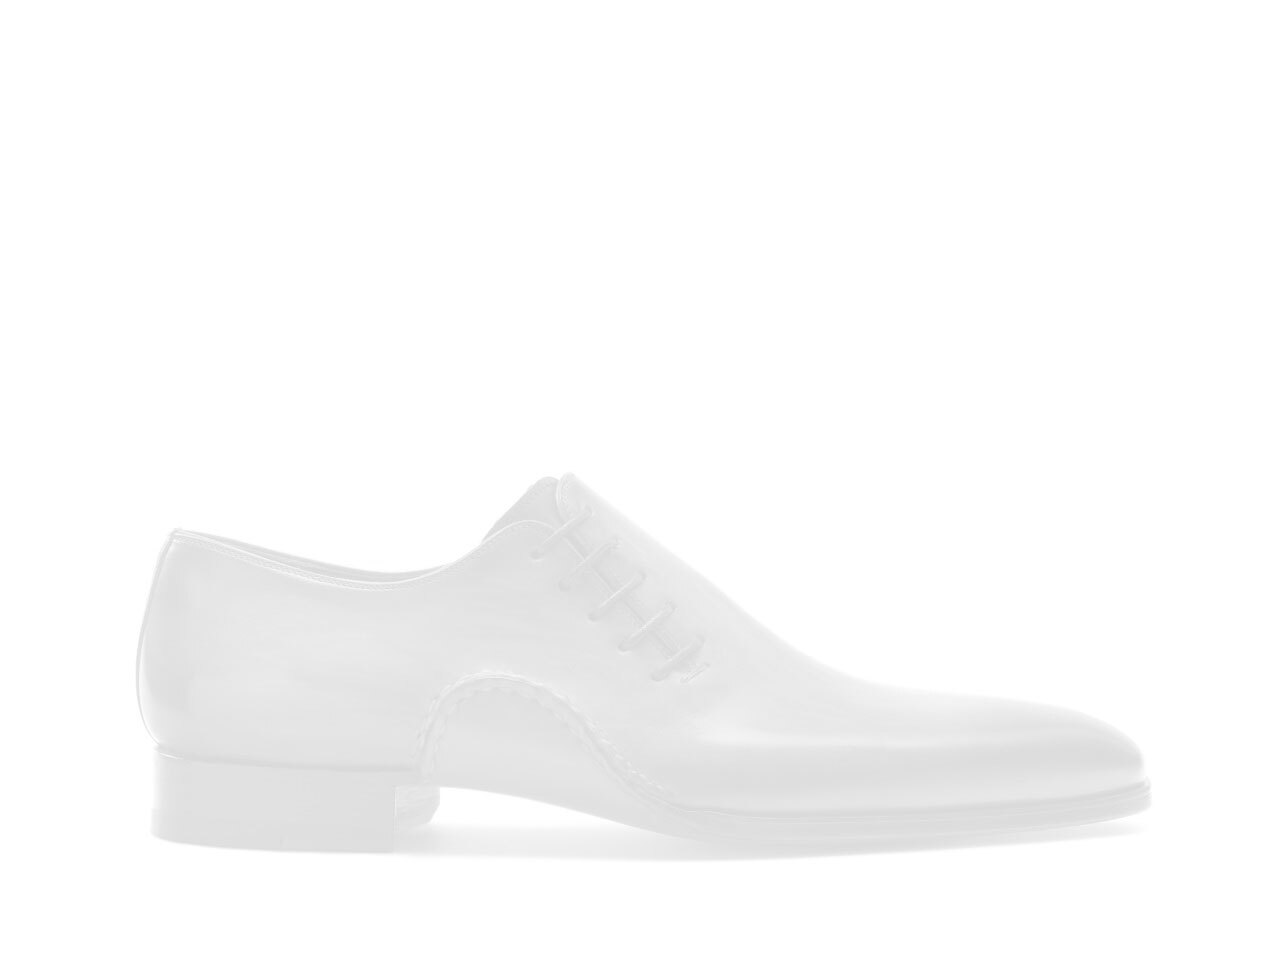 Sole of the Magnanni Meira Black Men's Single Monk Strap Shoes